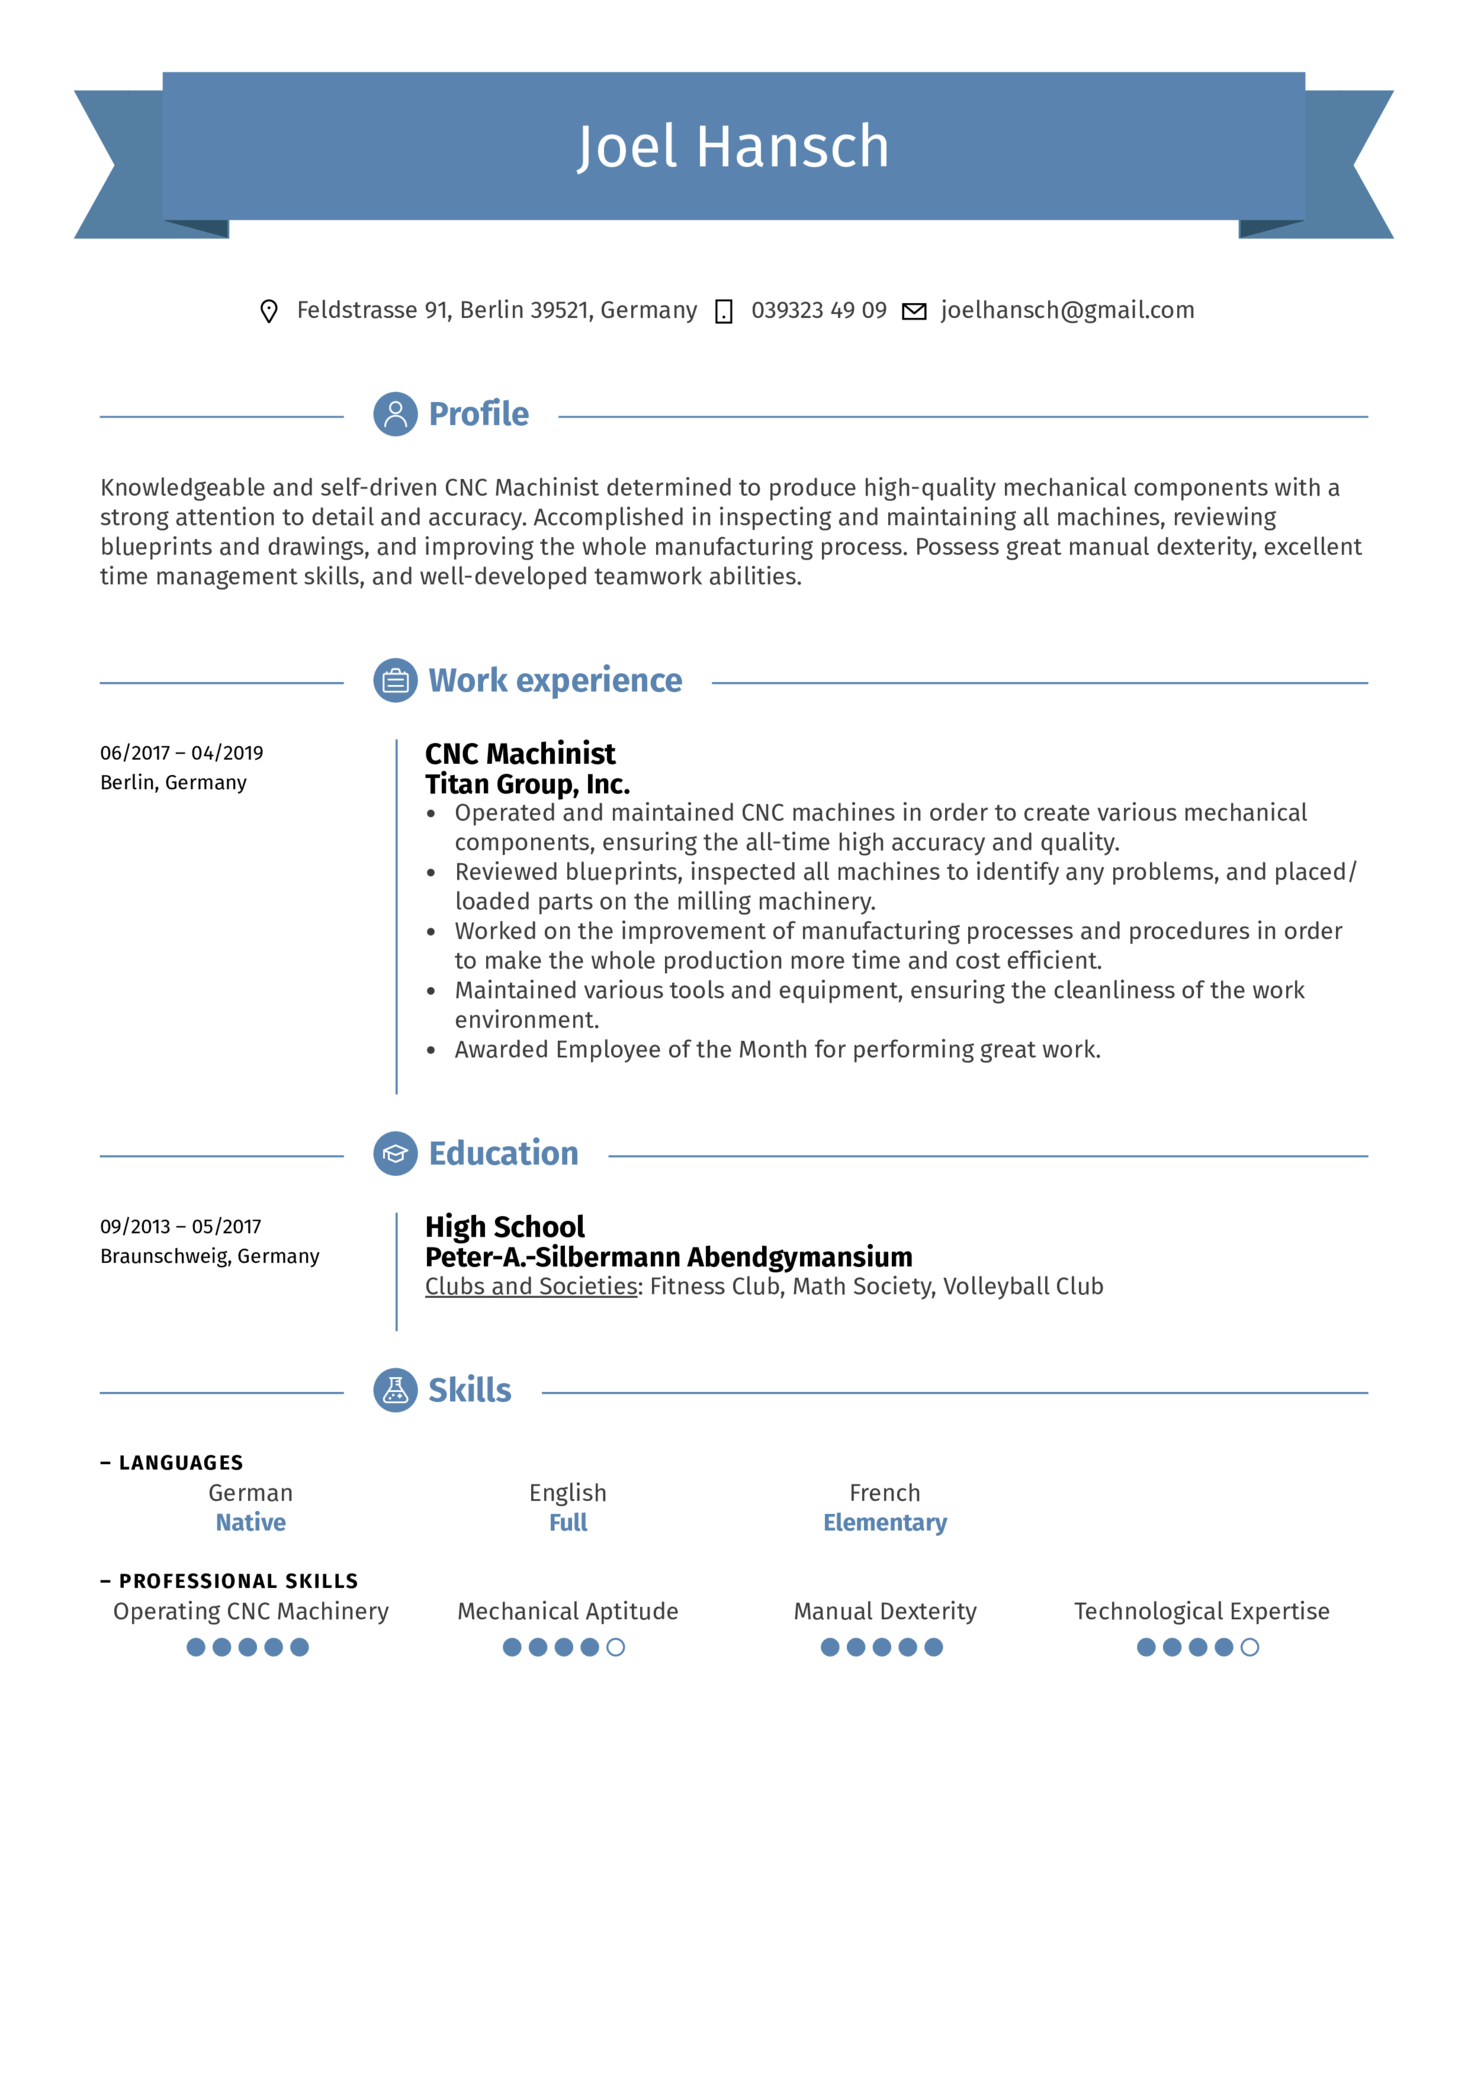 CNC Machinist Resume Sample (Teil 1)